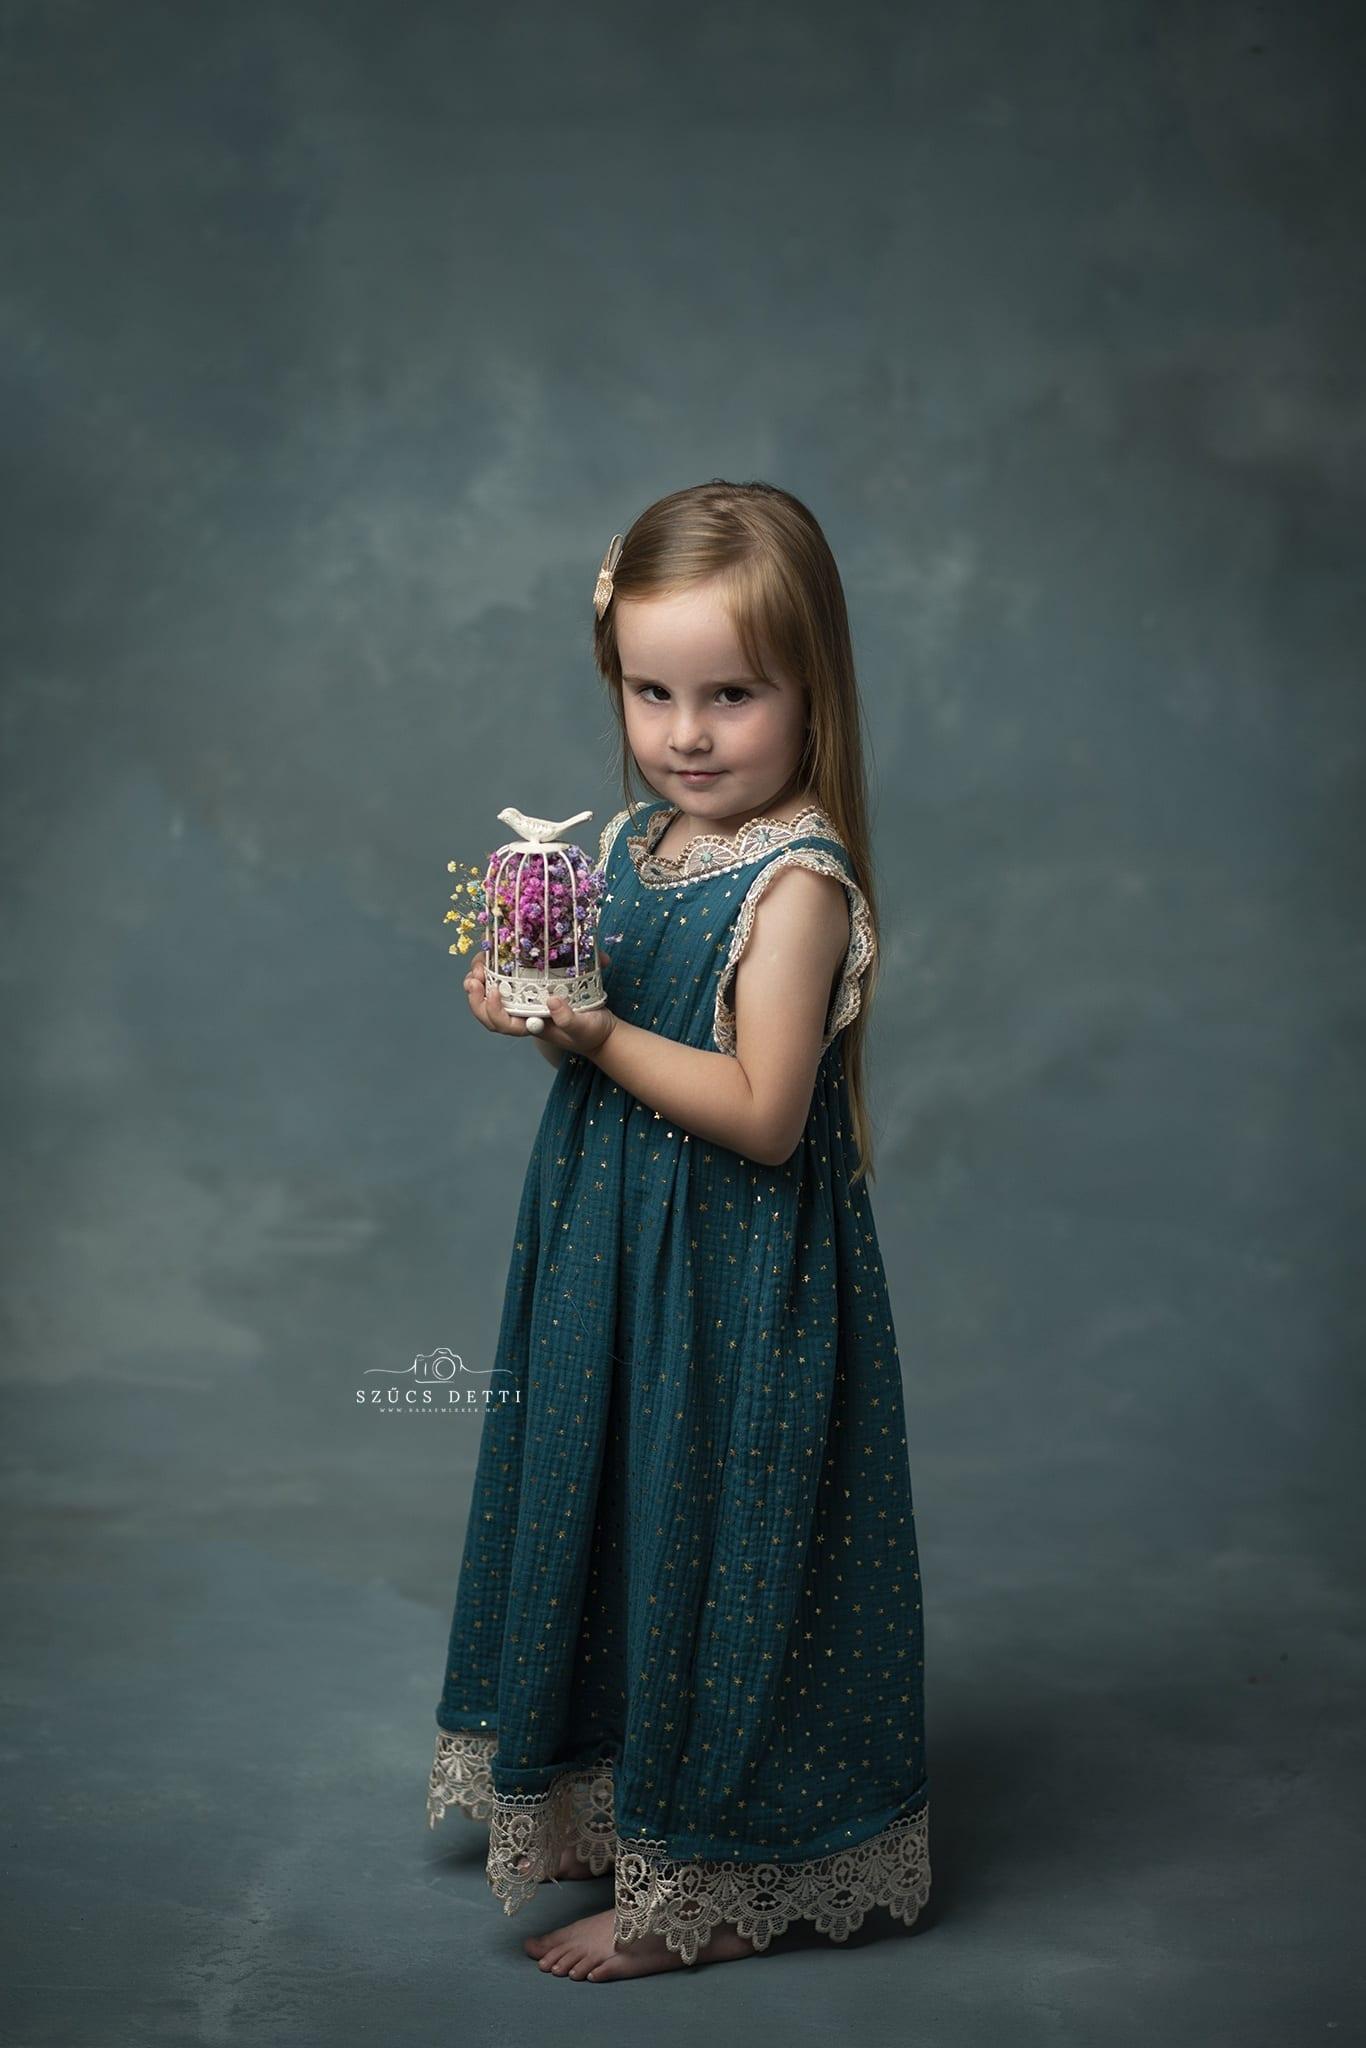 Gyerekportré fotósorozat budapesti műteremben